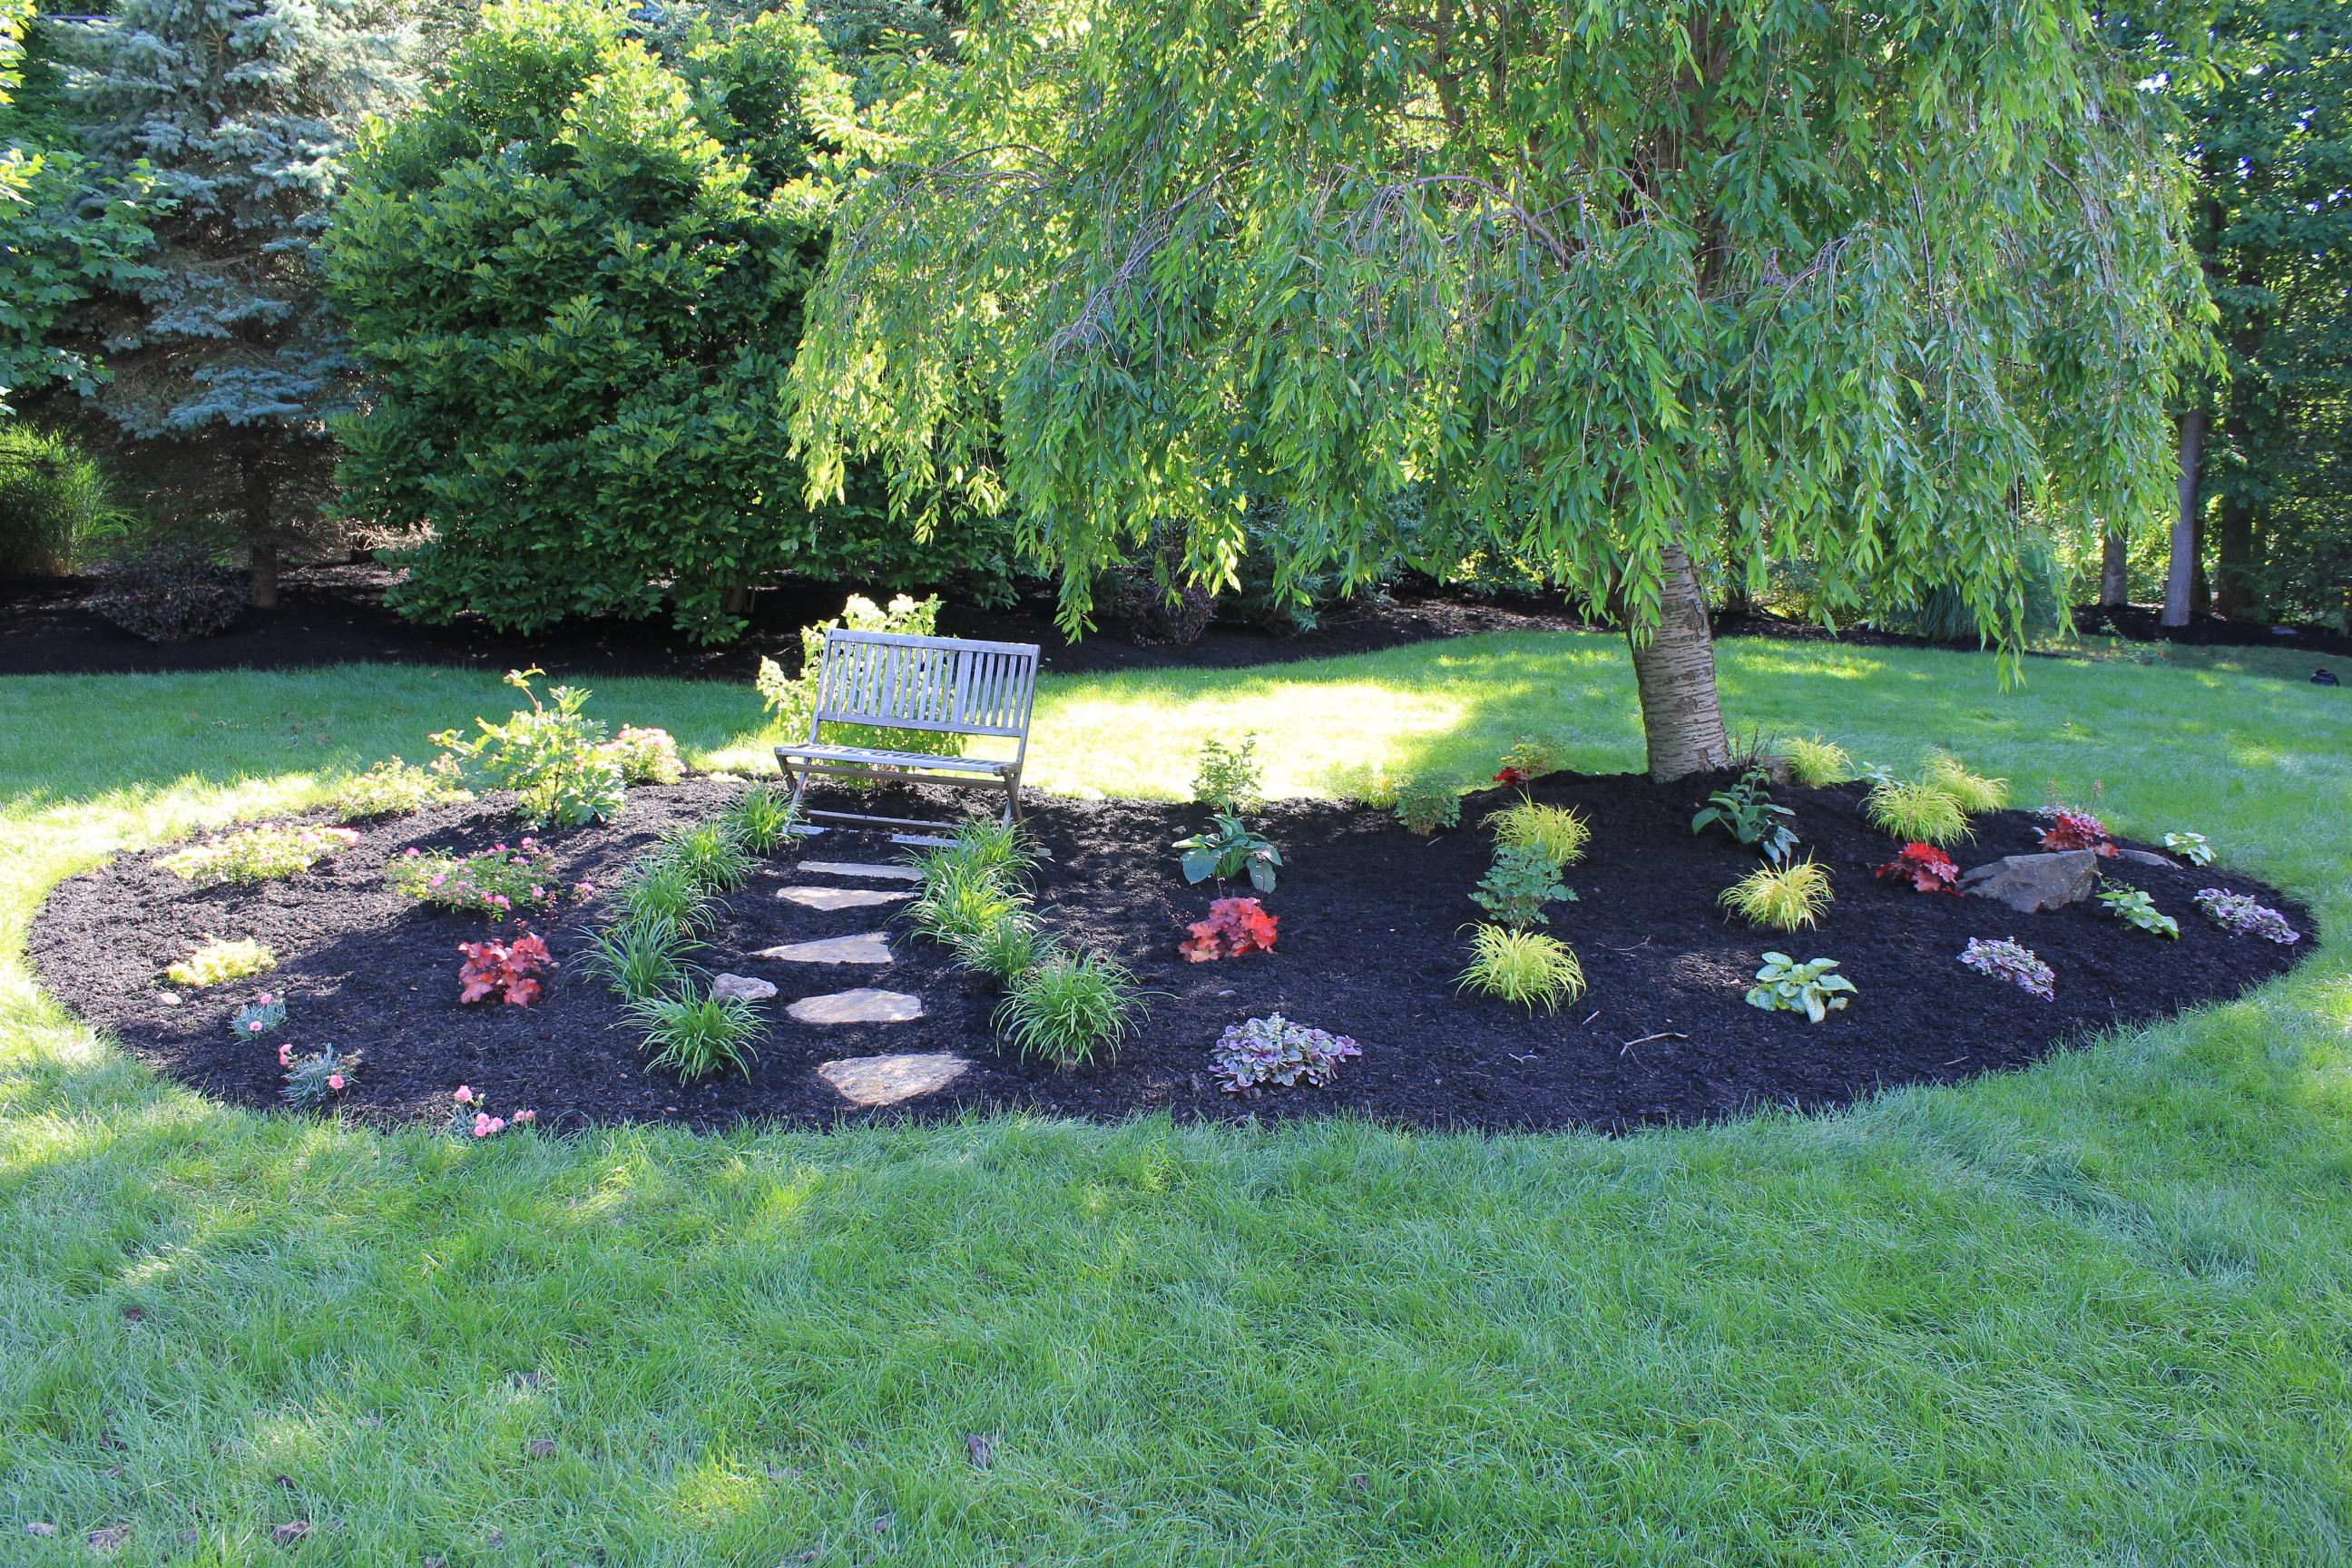 Quality garden designs llc in butler nj 07405 for Garden design llc